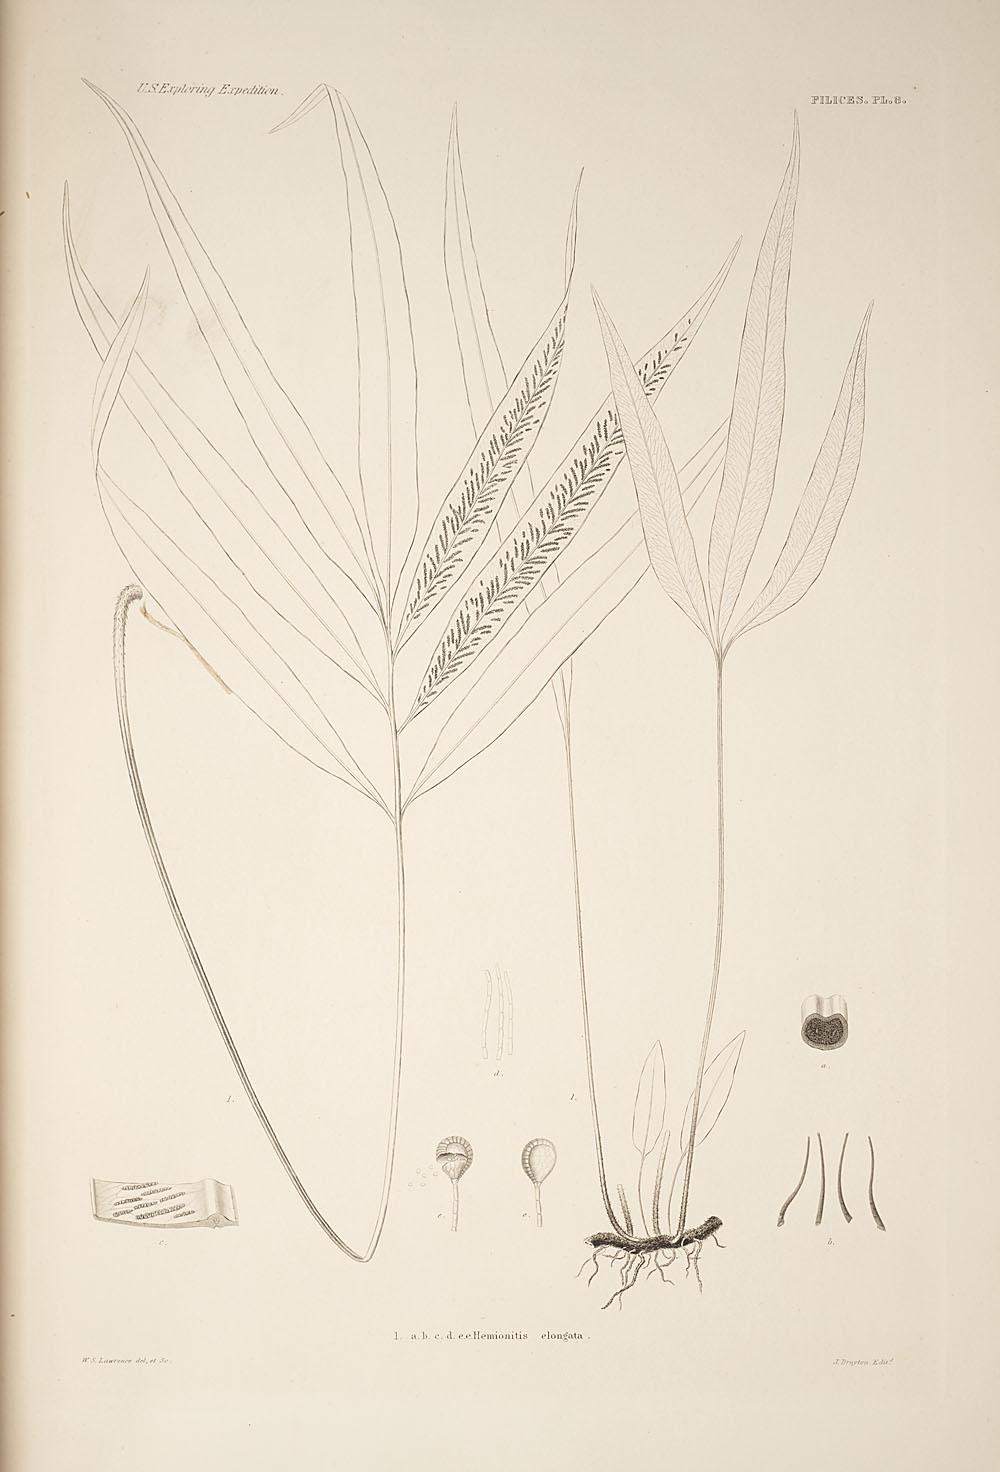 Fig. 1. Hemionitis elongata,  Image number:SIL19-24a-020